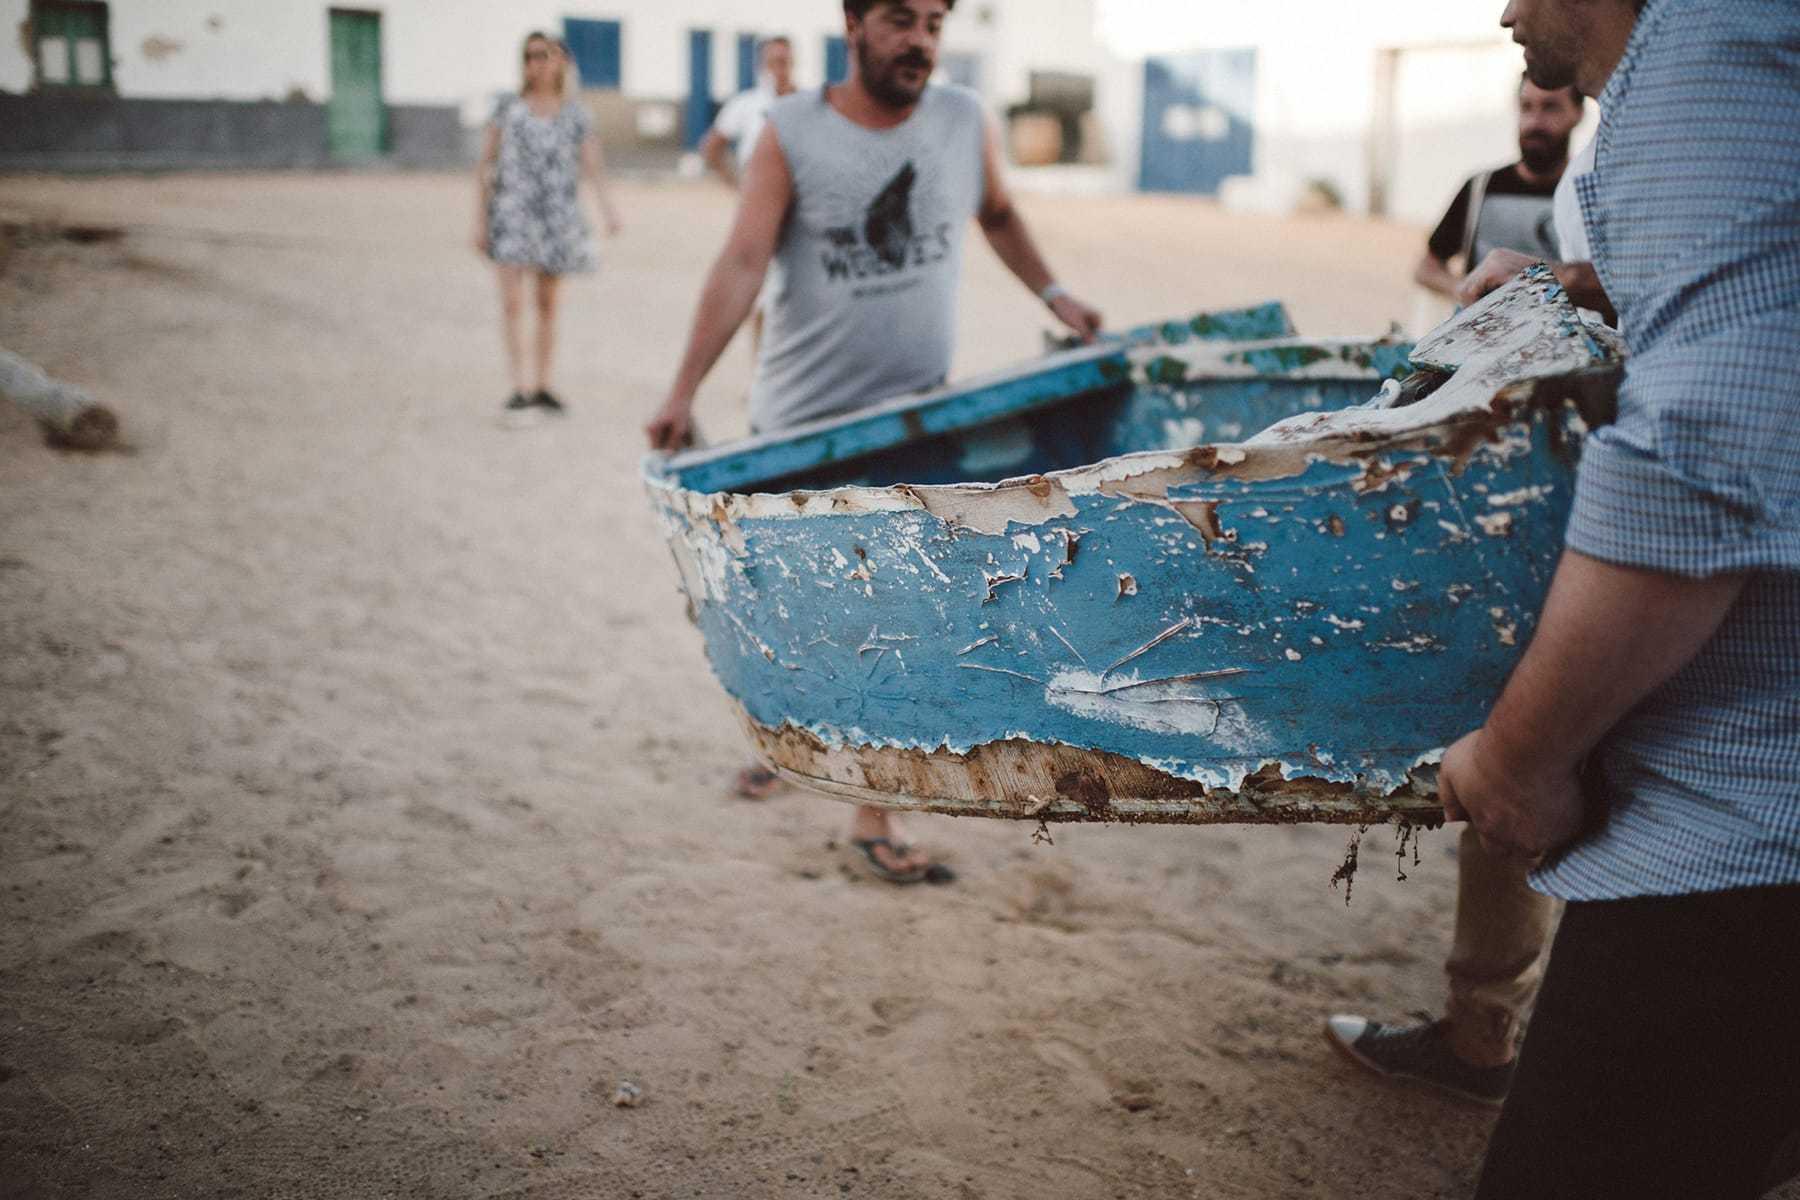 wolves_workshop_hilario_sanchez_fotografo_boda_españa_367